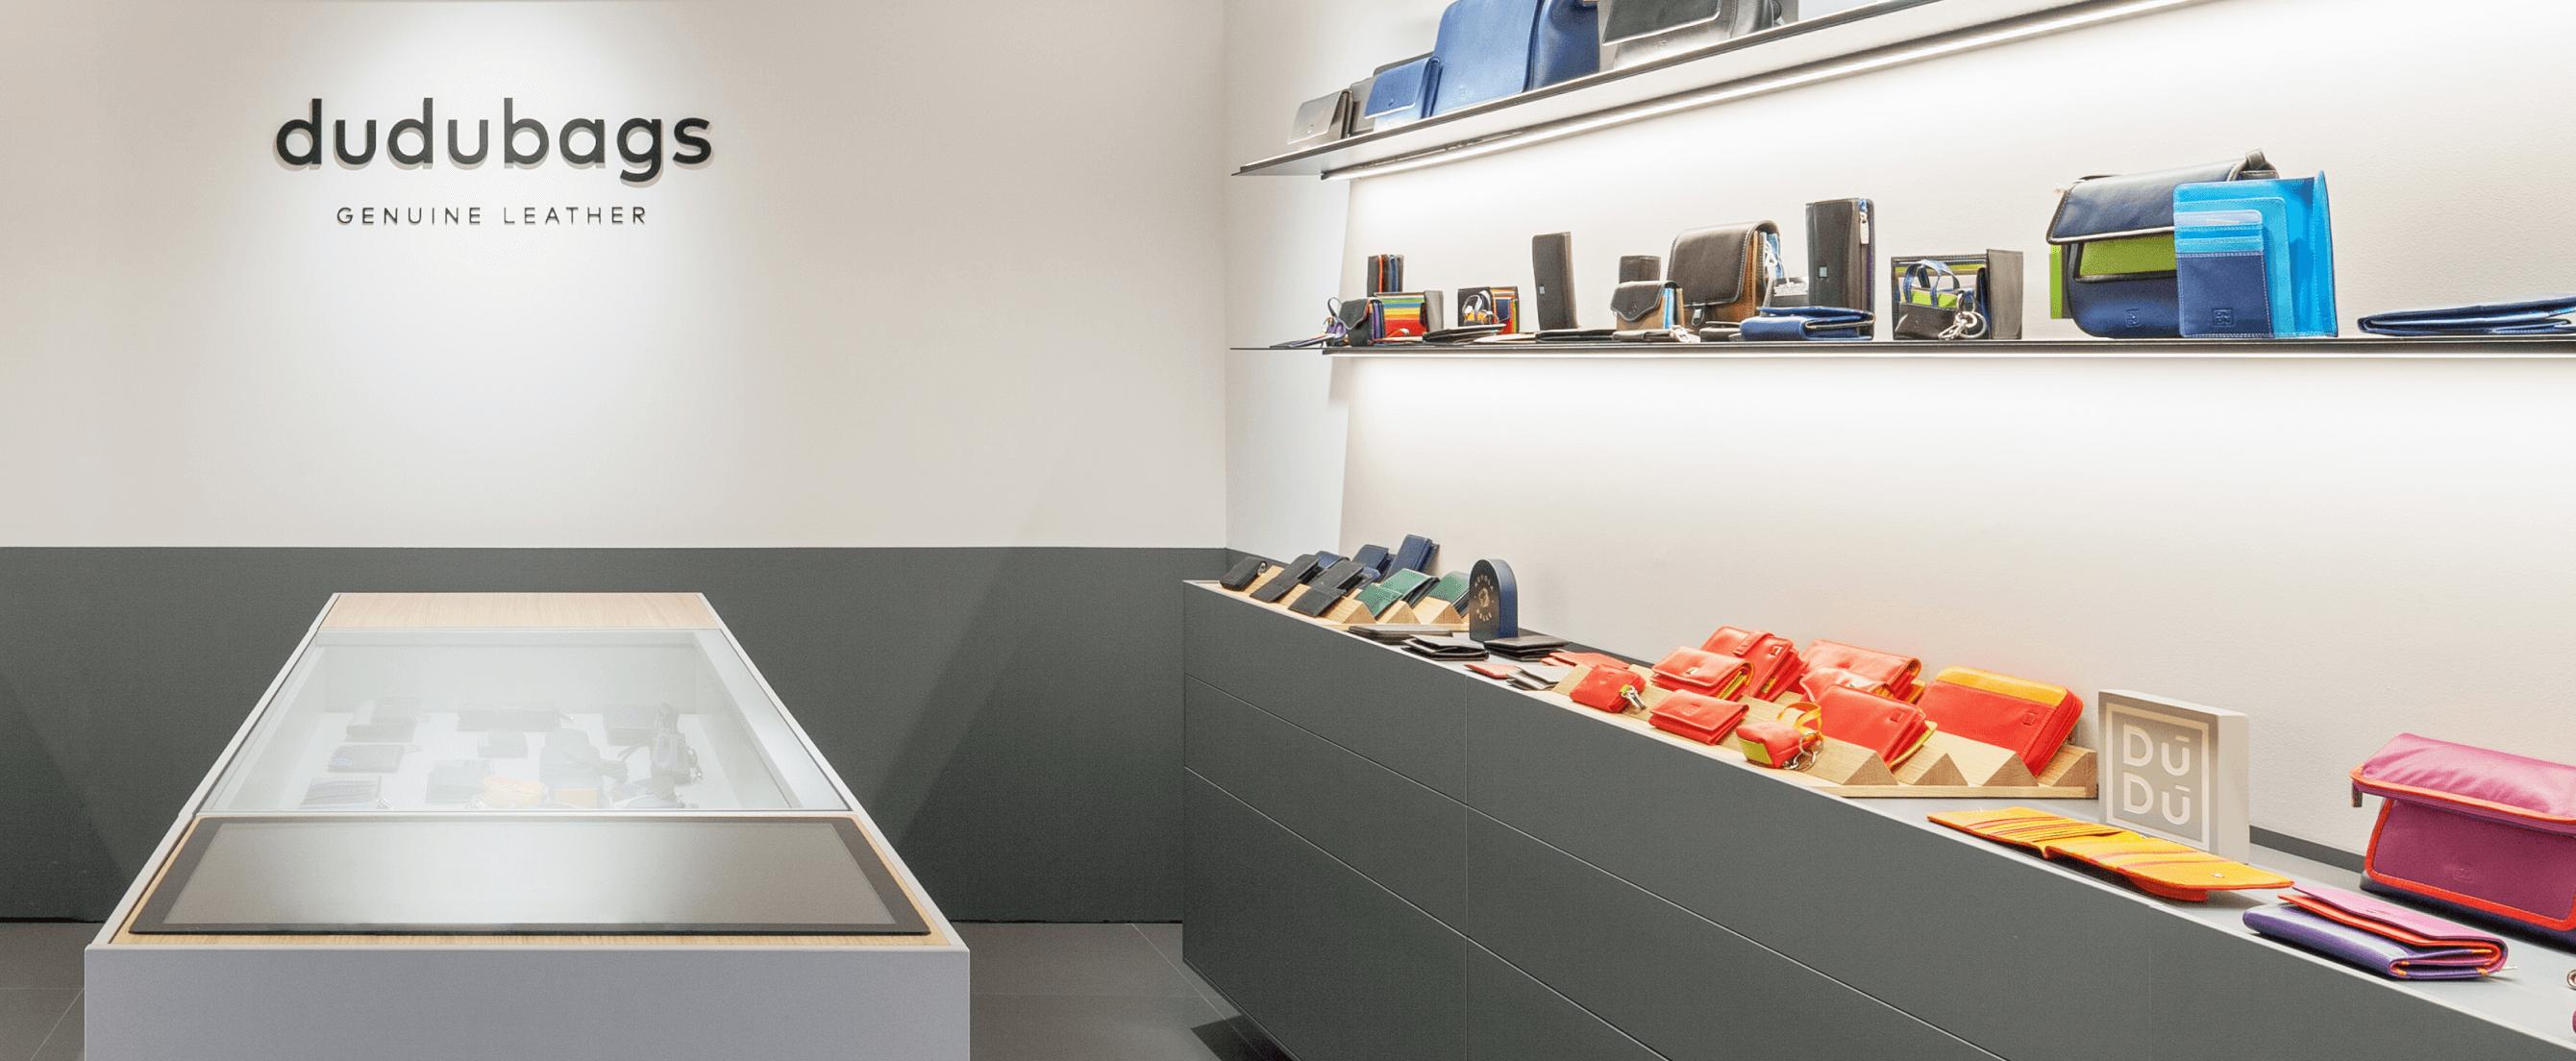 Dudubags Store Venezia